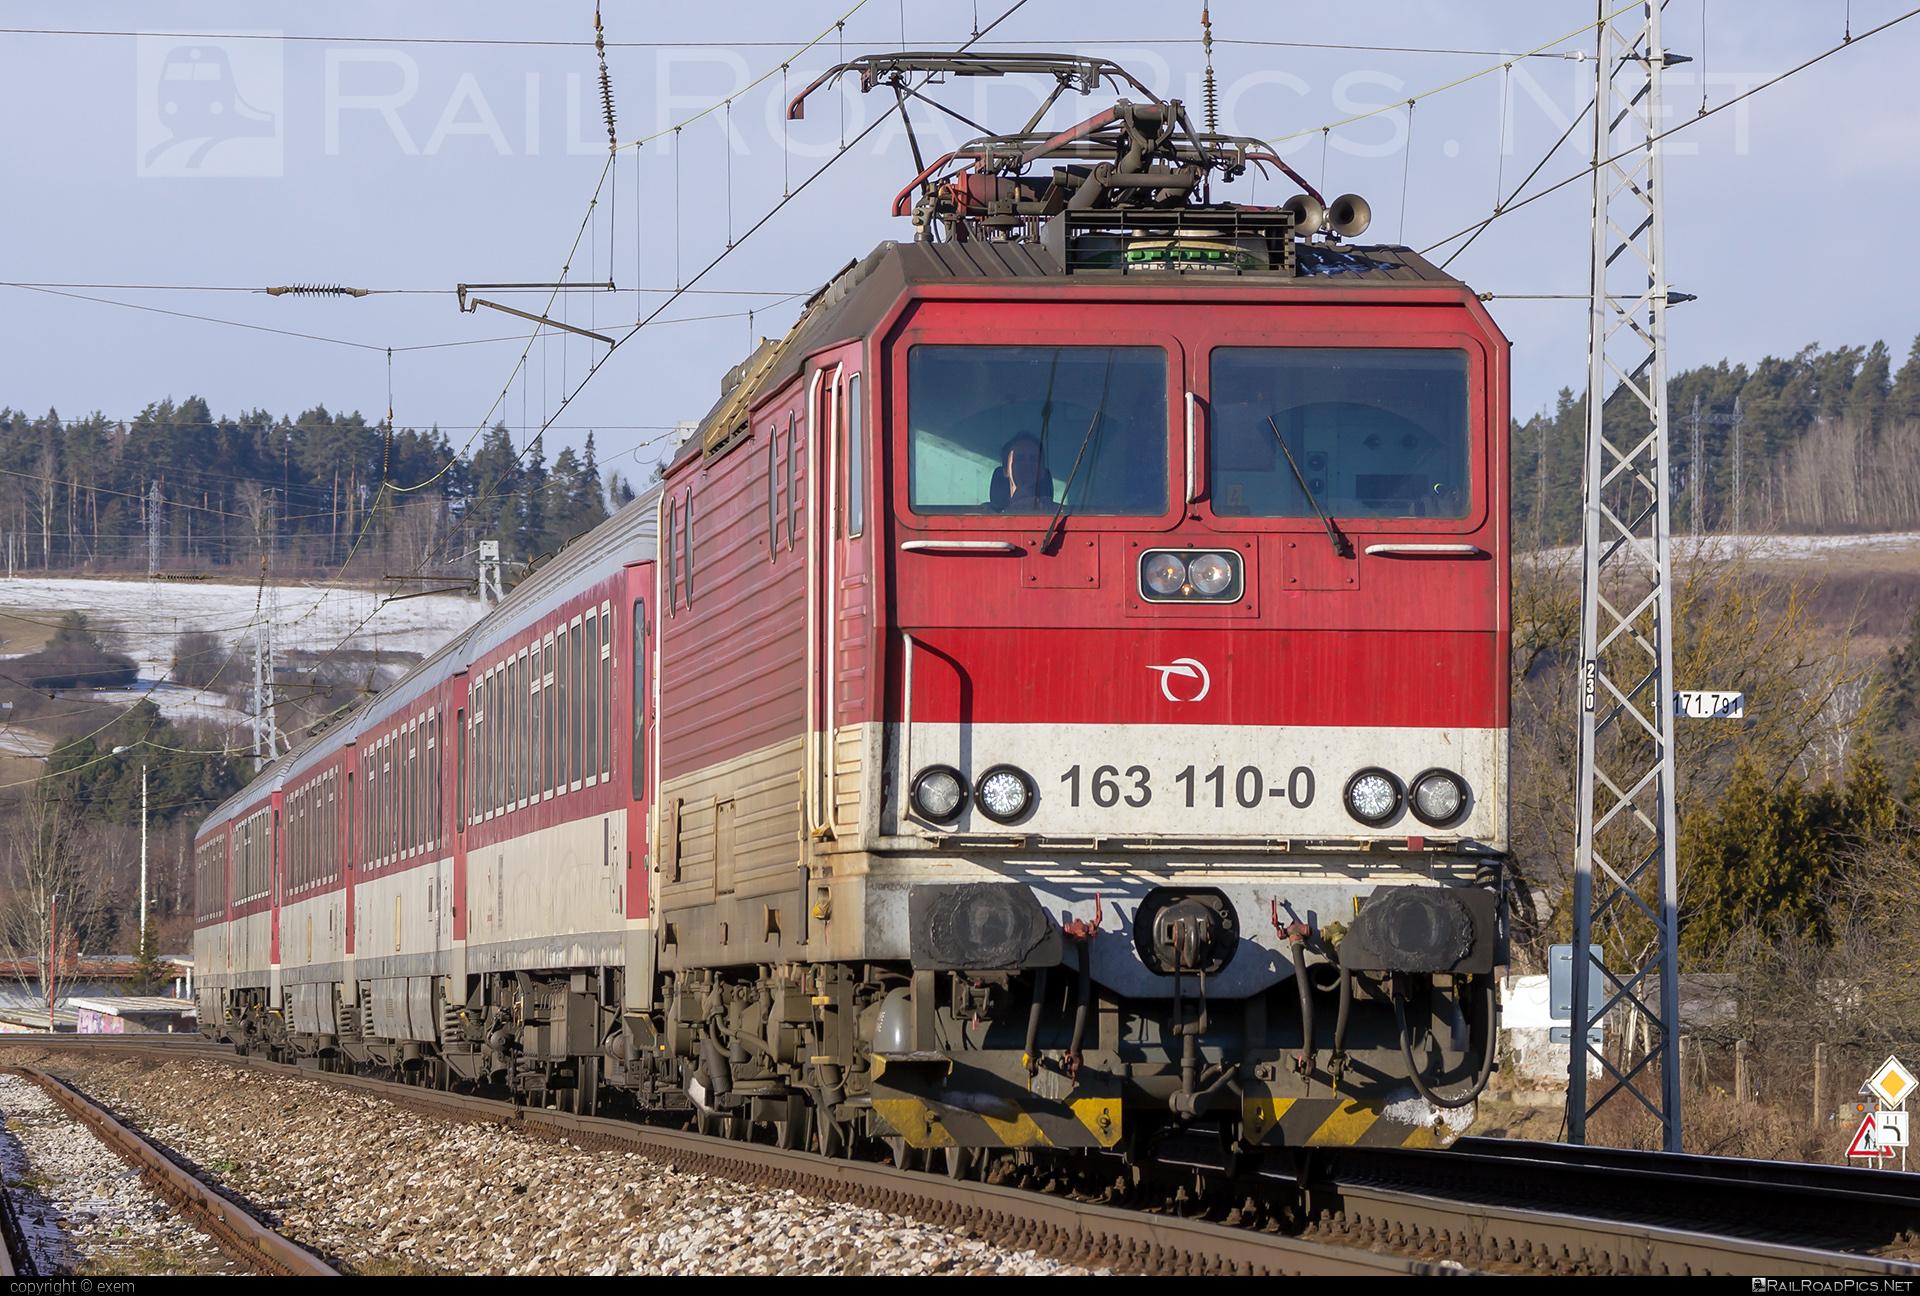 Škoda 71E - 163 110-0 operated by Železničná Spoločnost' Slovensko, a.s. #ZeleznicnaSpolocnostSlovensko #e4993 #locomotive163 #persing #skoda #skoda71e #zssk